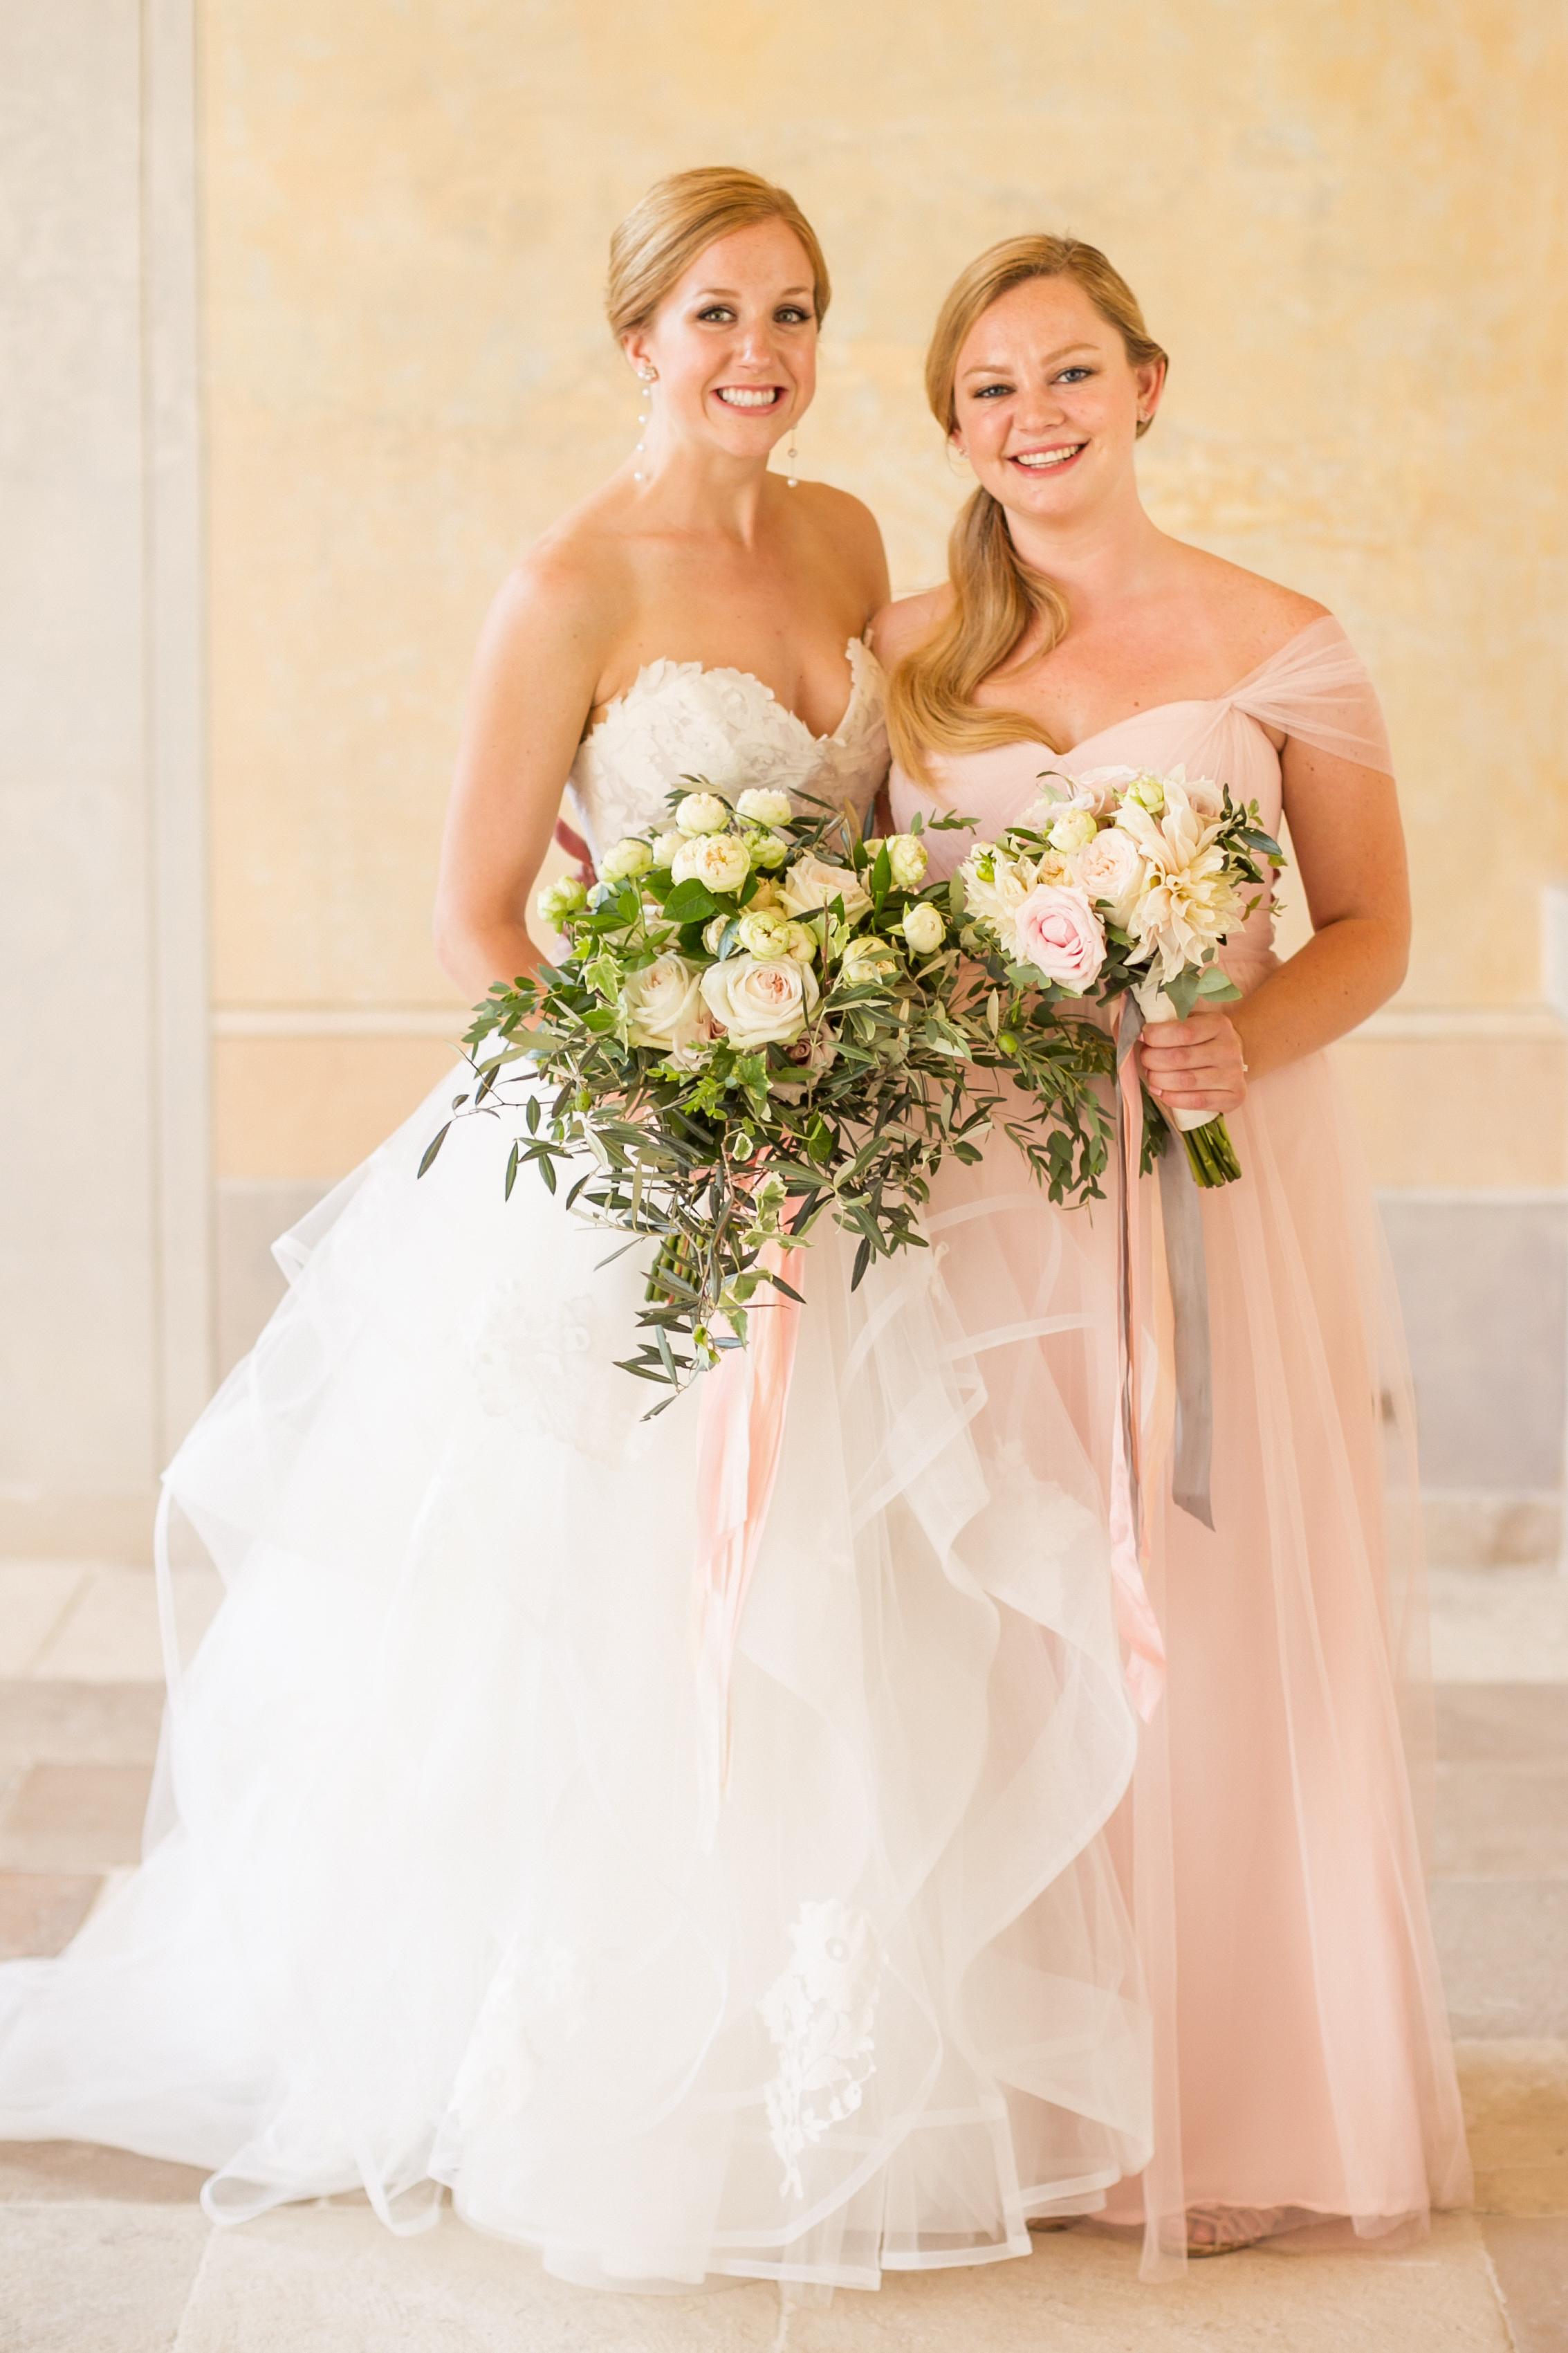 04_bridesmaids-0444.jpg